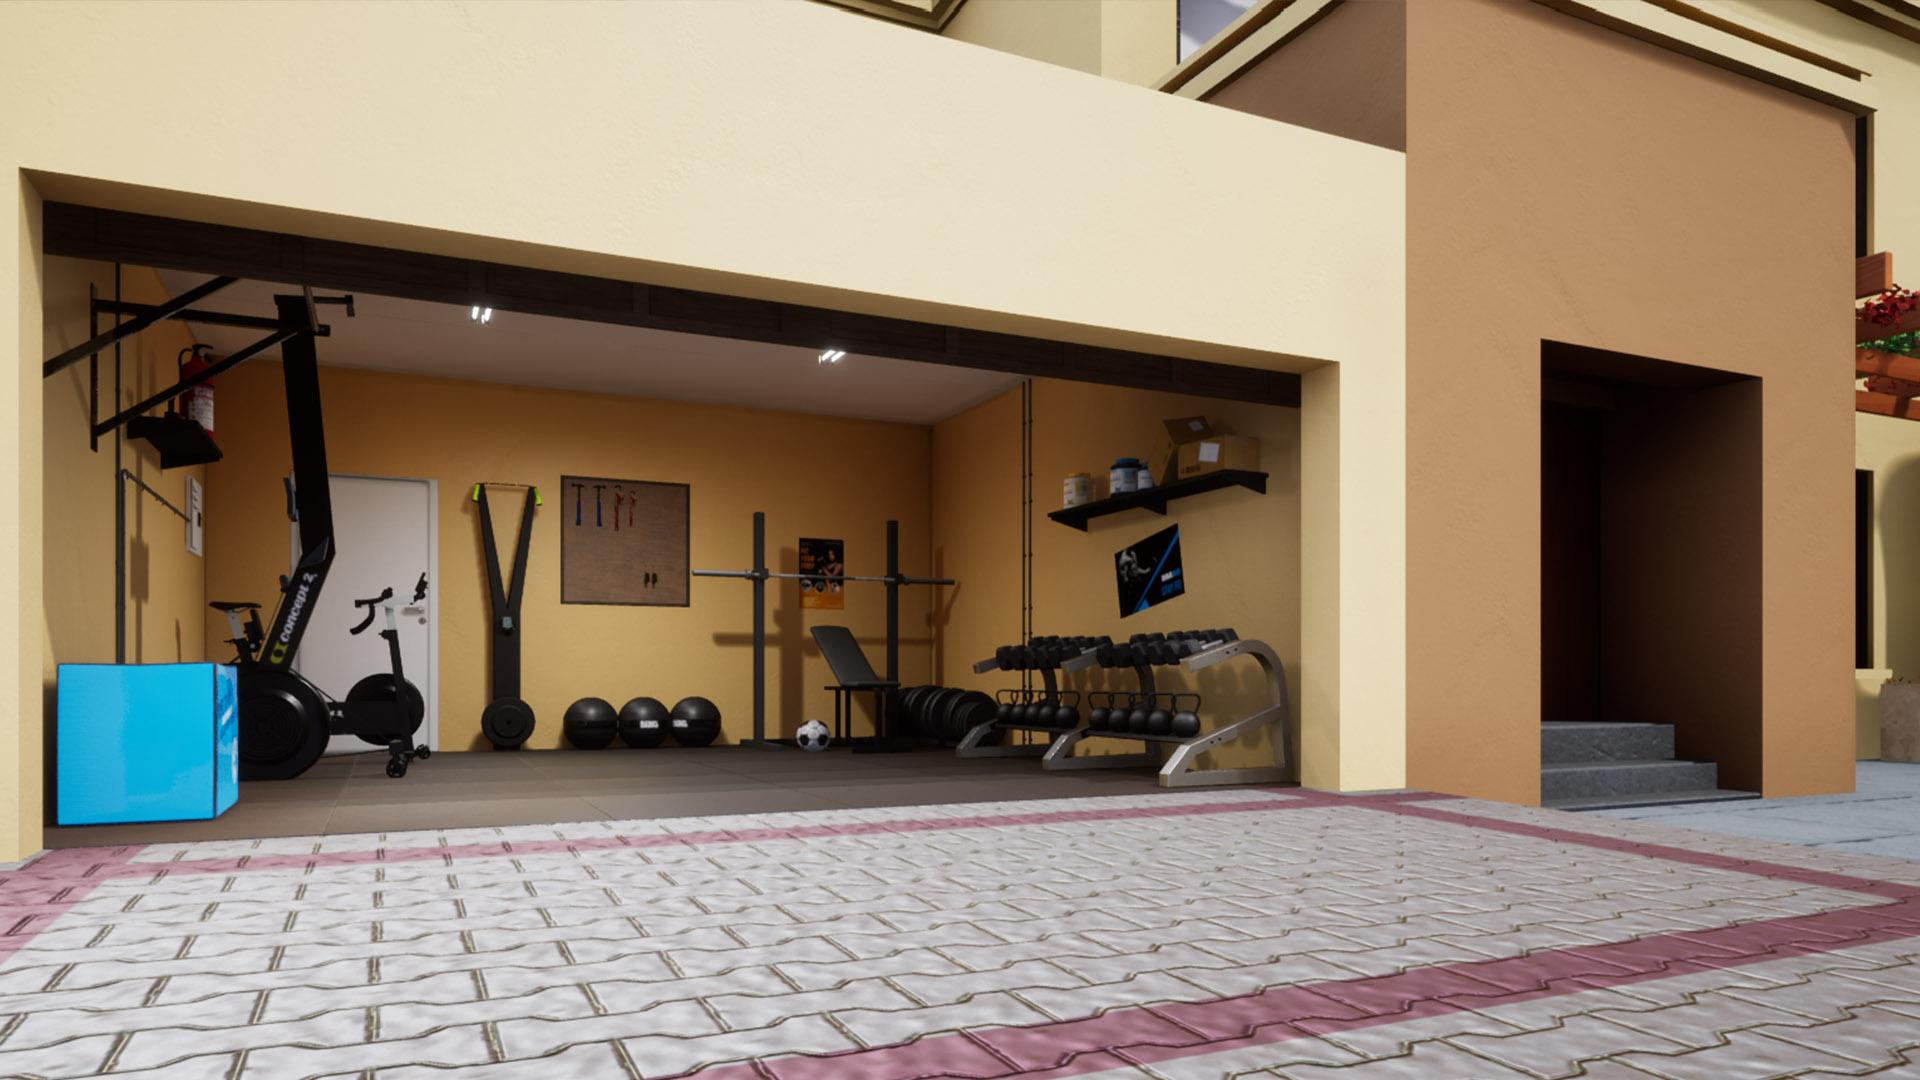 Rebel gym design - Home gym in a garage with Rebel Elite Fitness gear